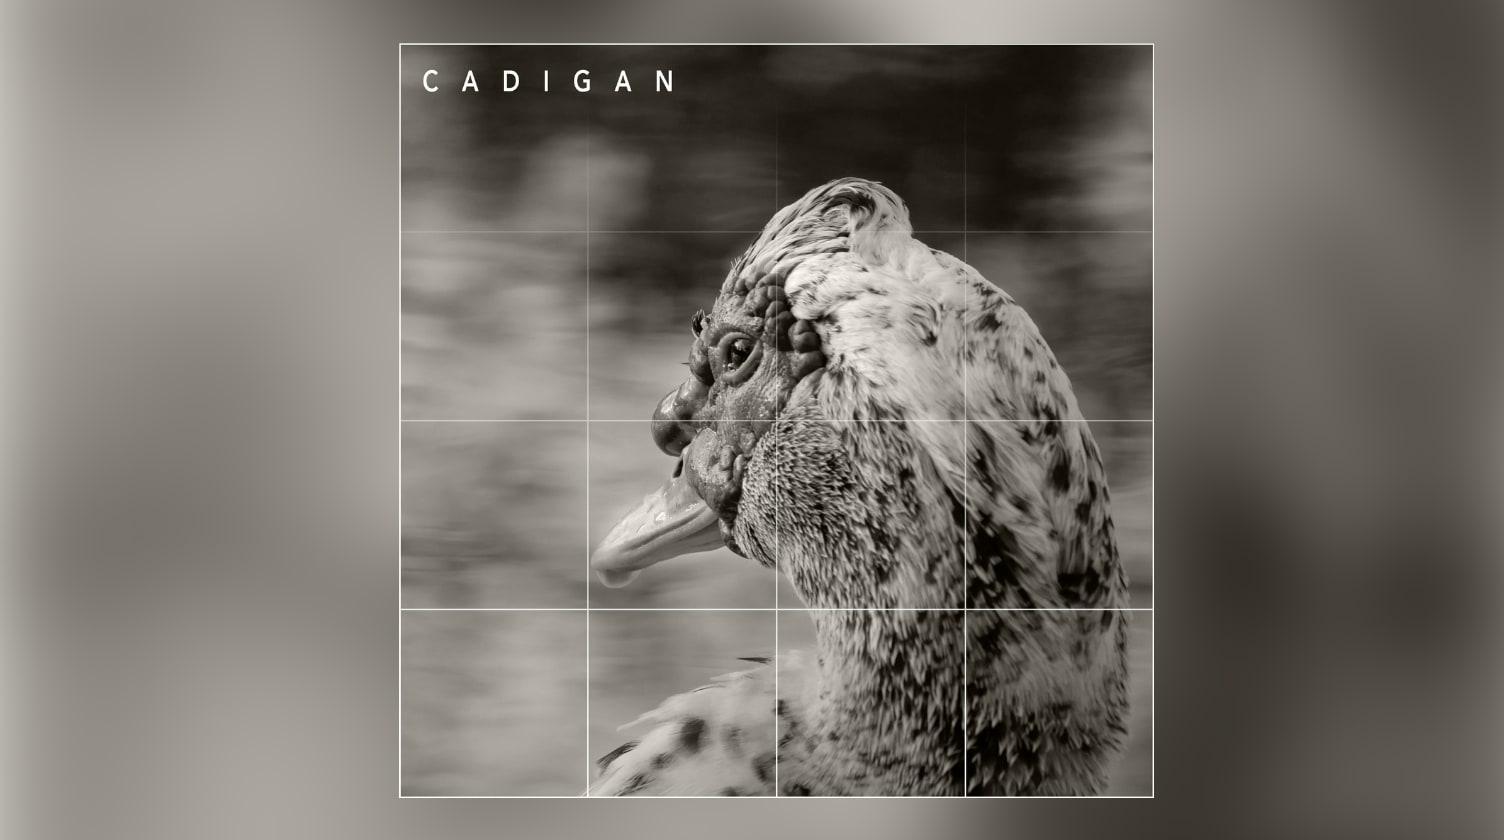 Cadigan